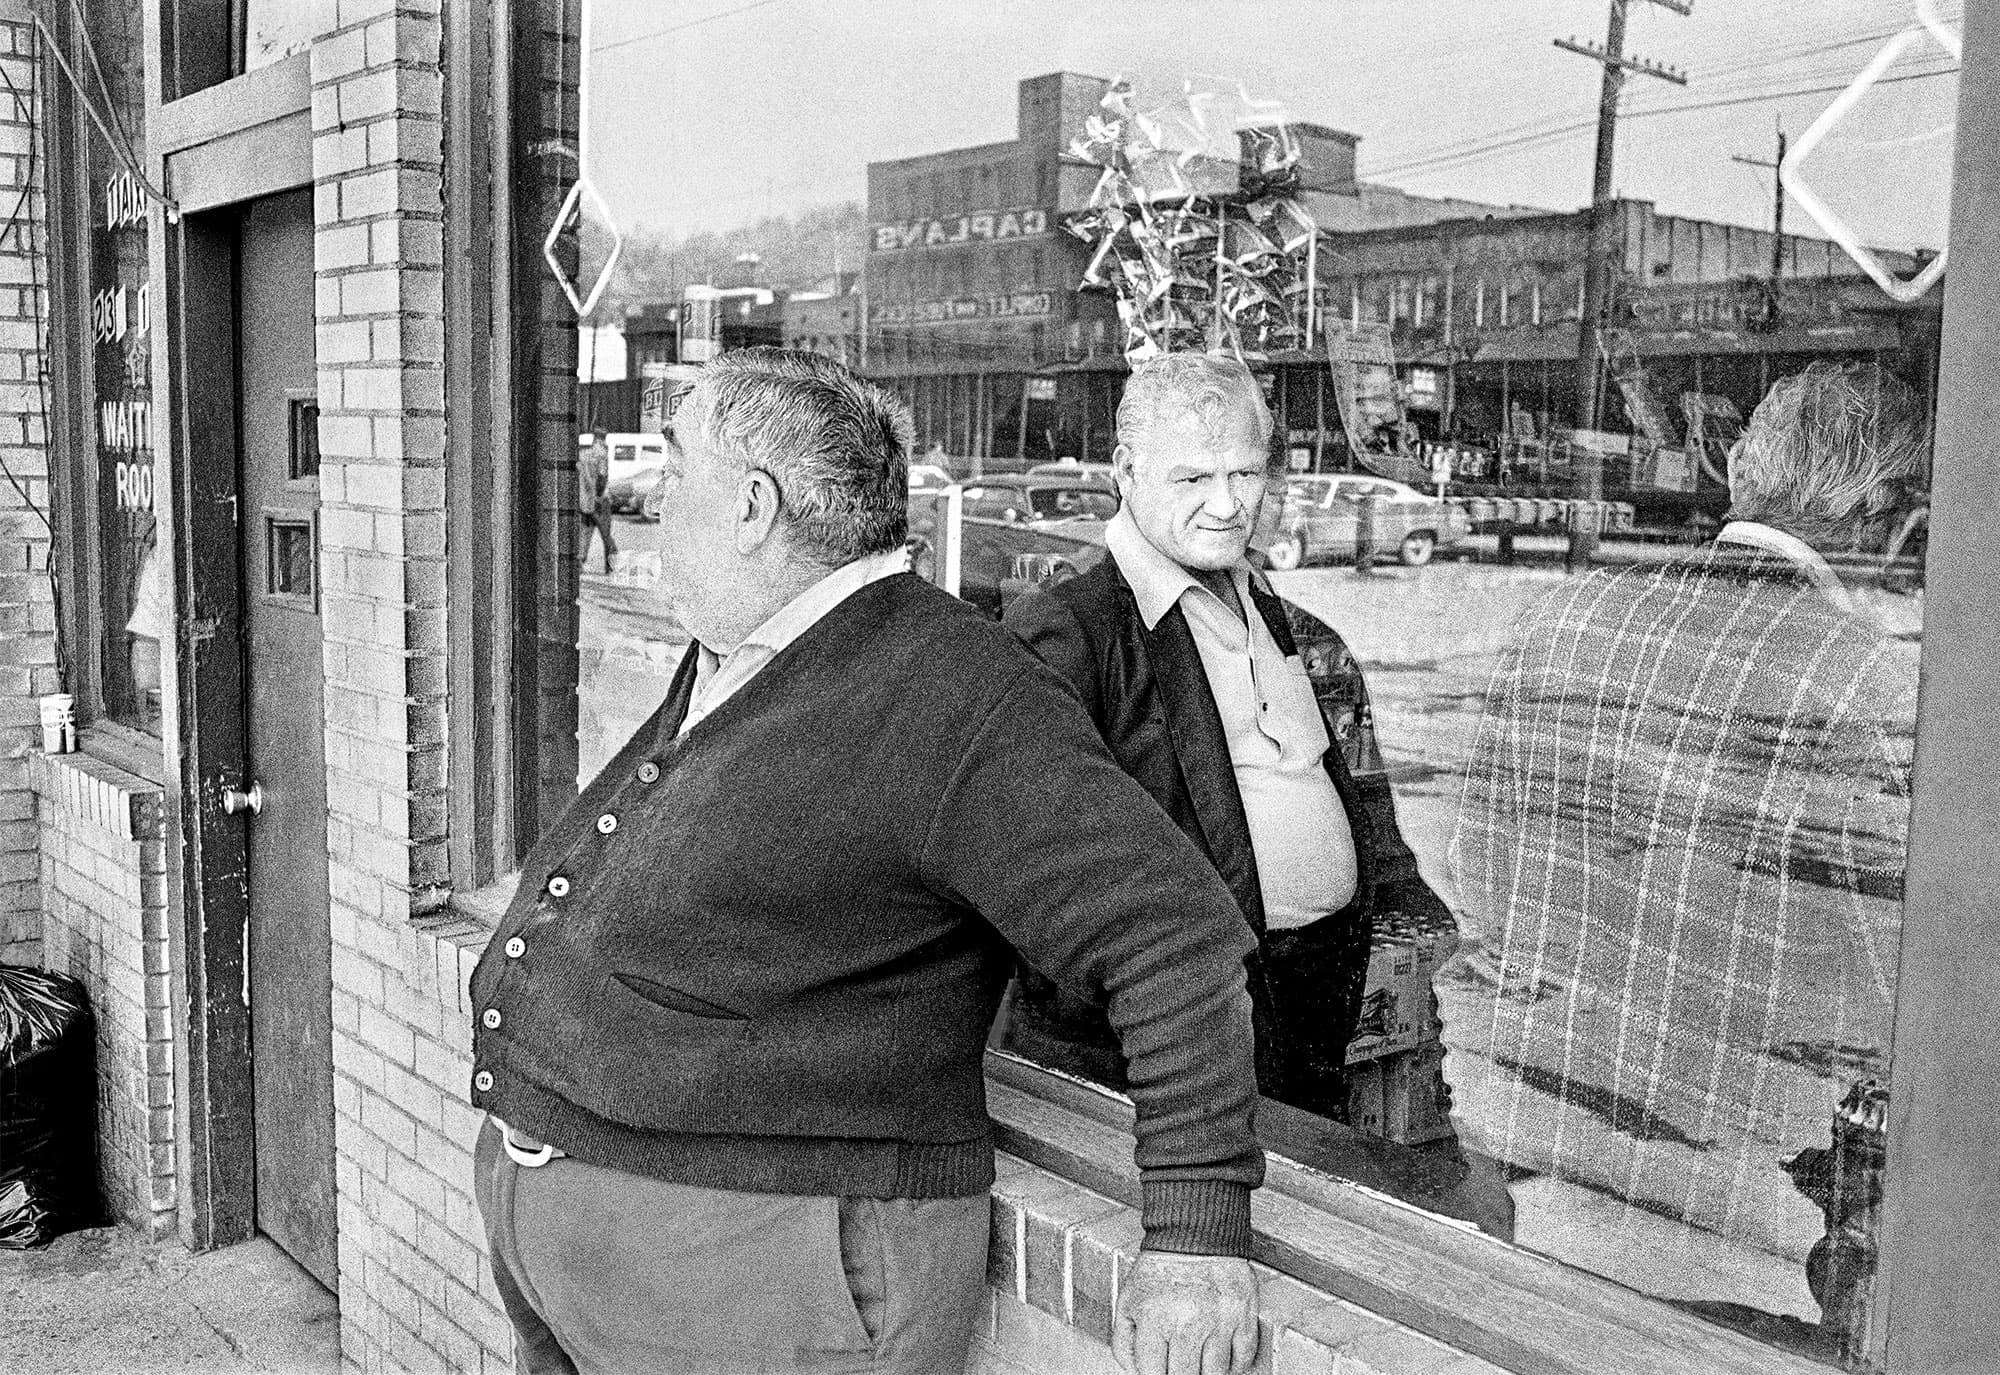 West-Virginia-#4-1978-arthur-lazar